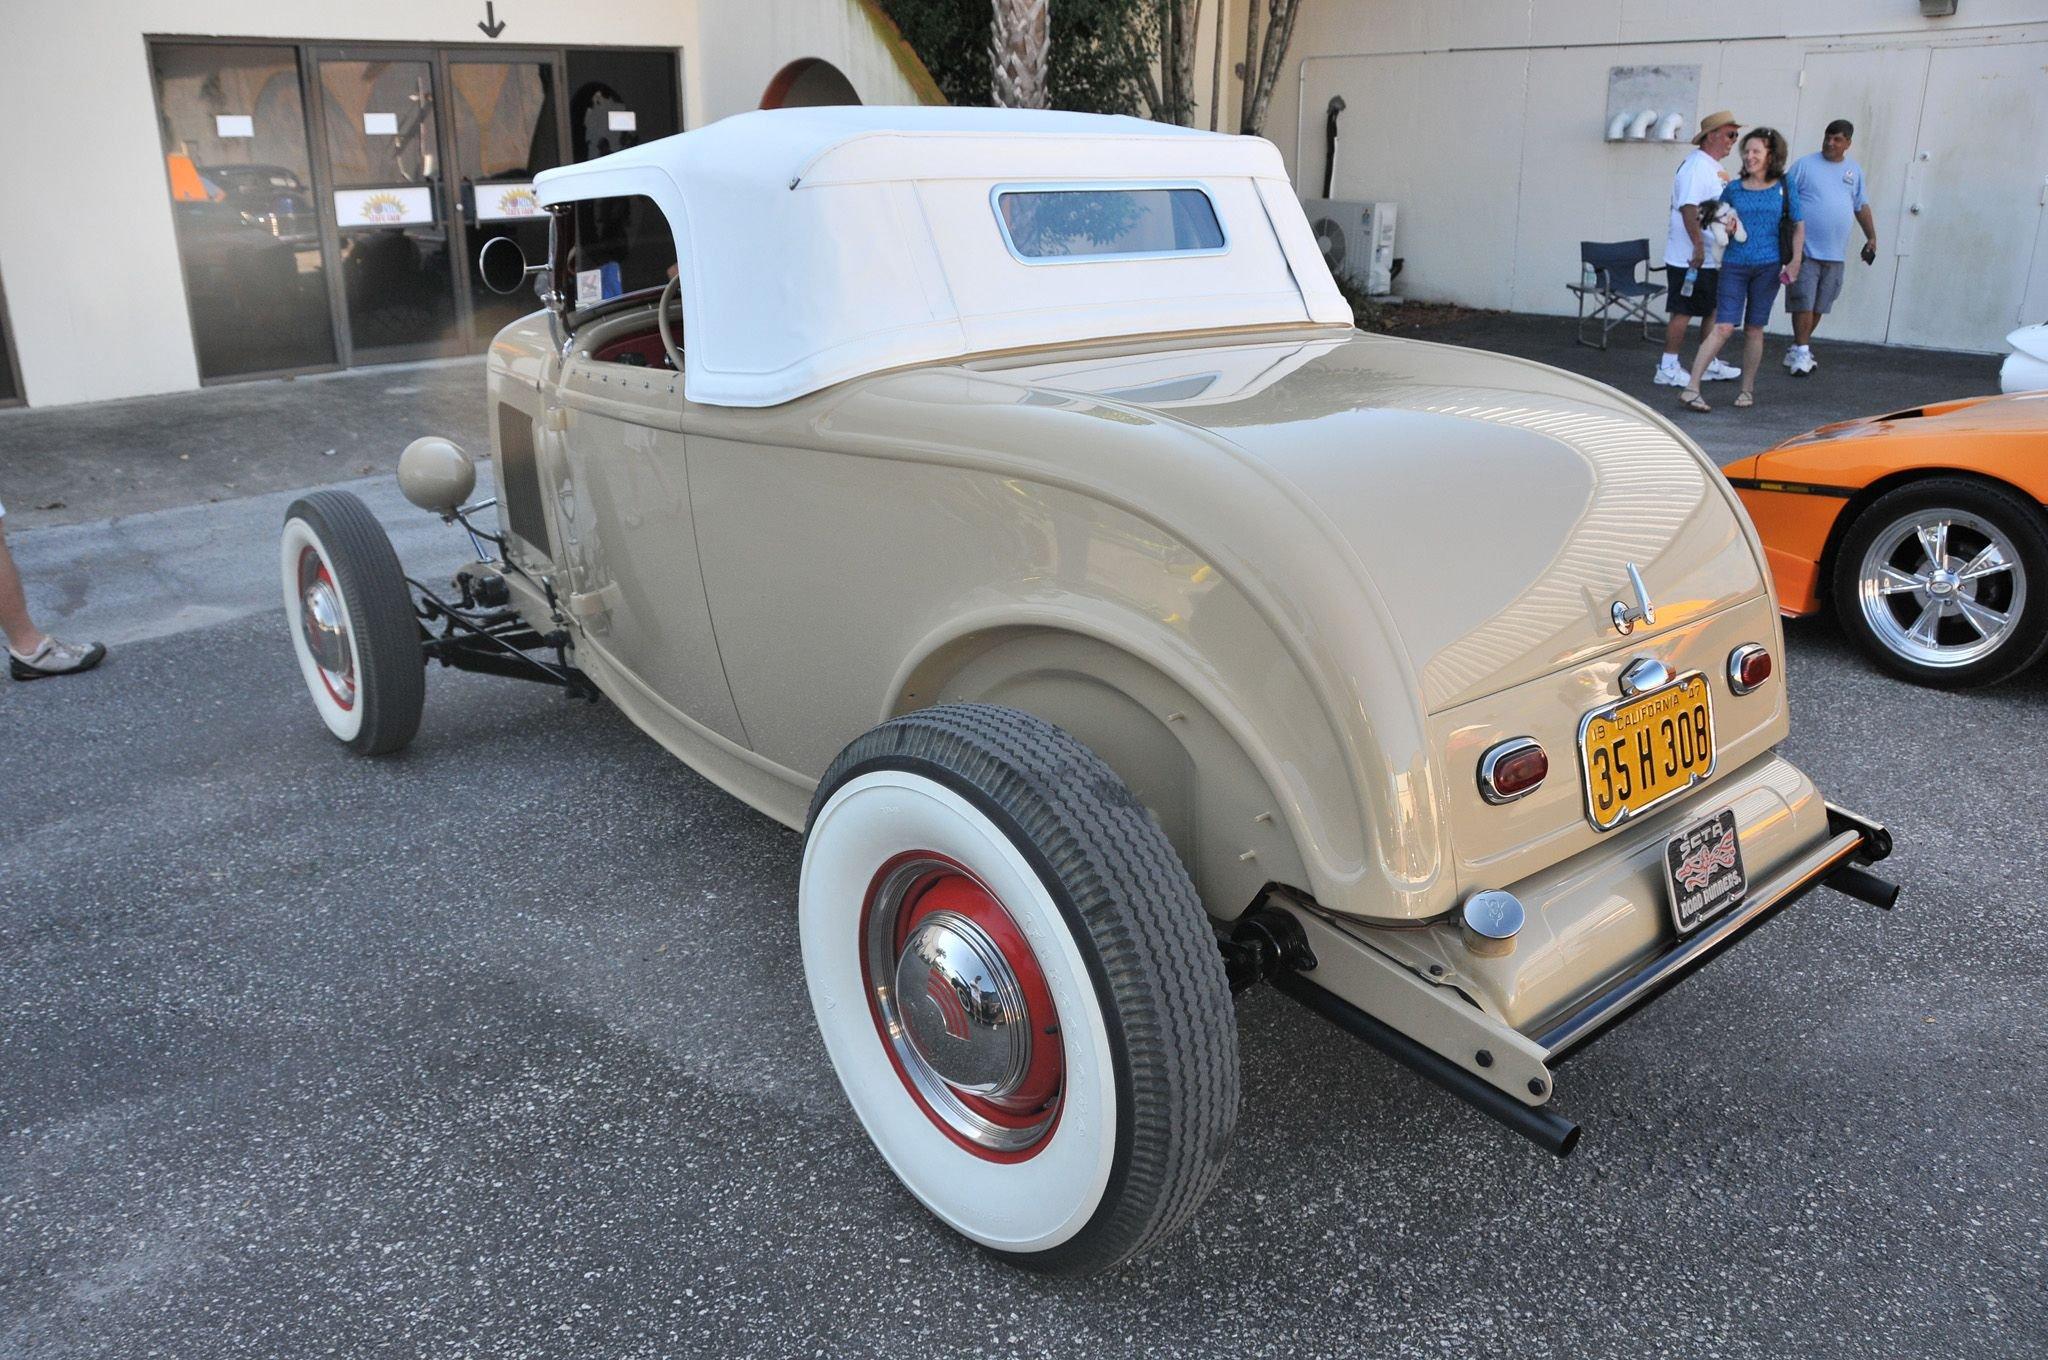 1932 Ford Roadster-08 wallpaper